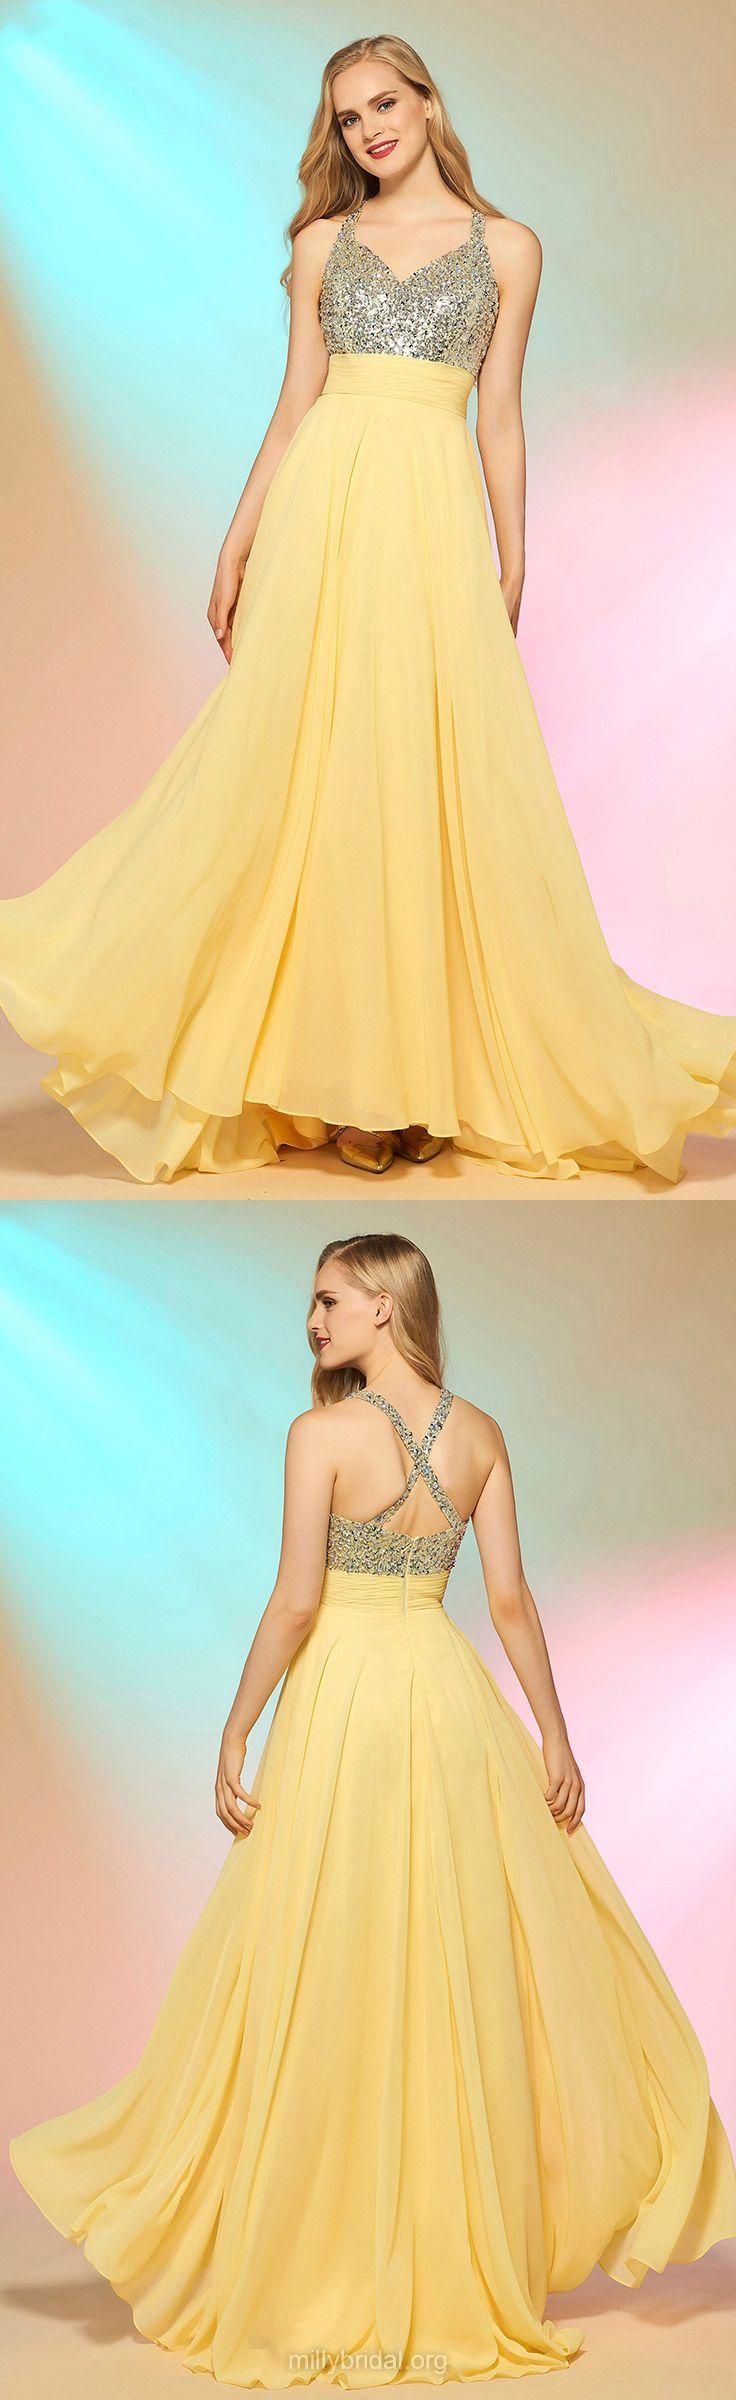 Yellow prom dresses long prom dresses aline prom dresses vneck